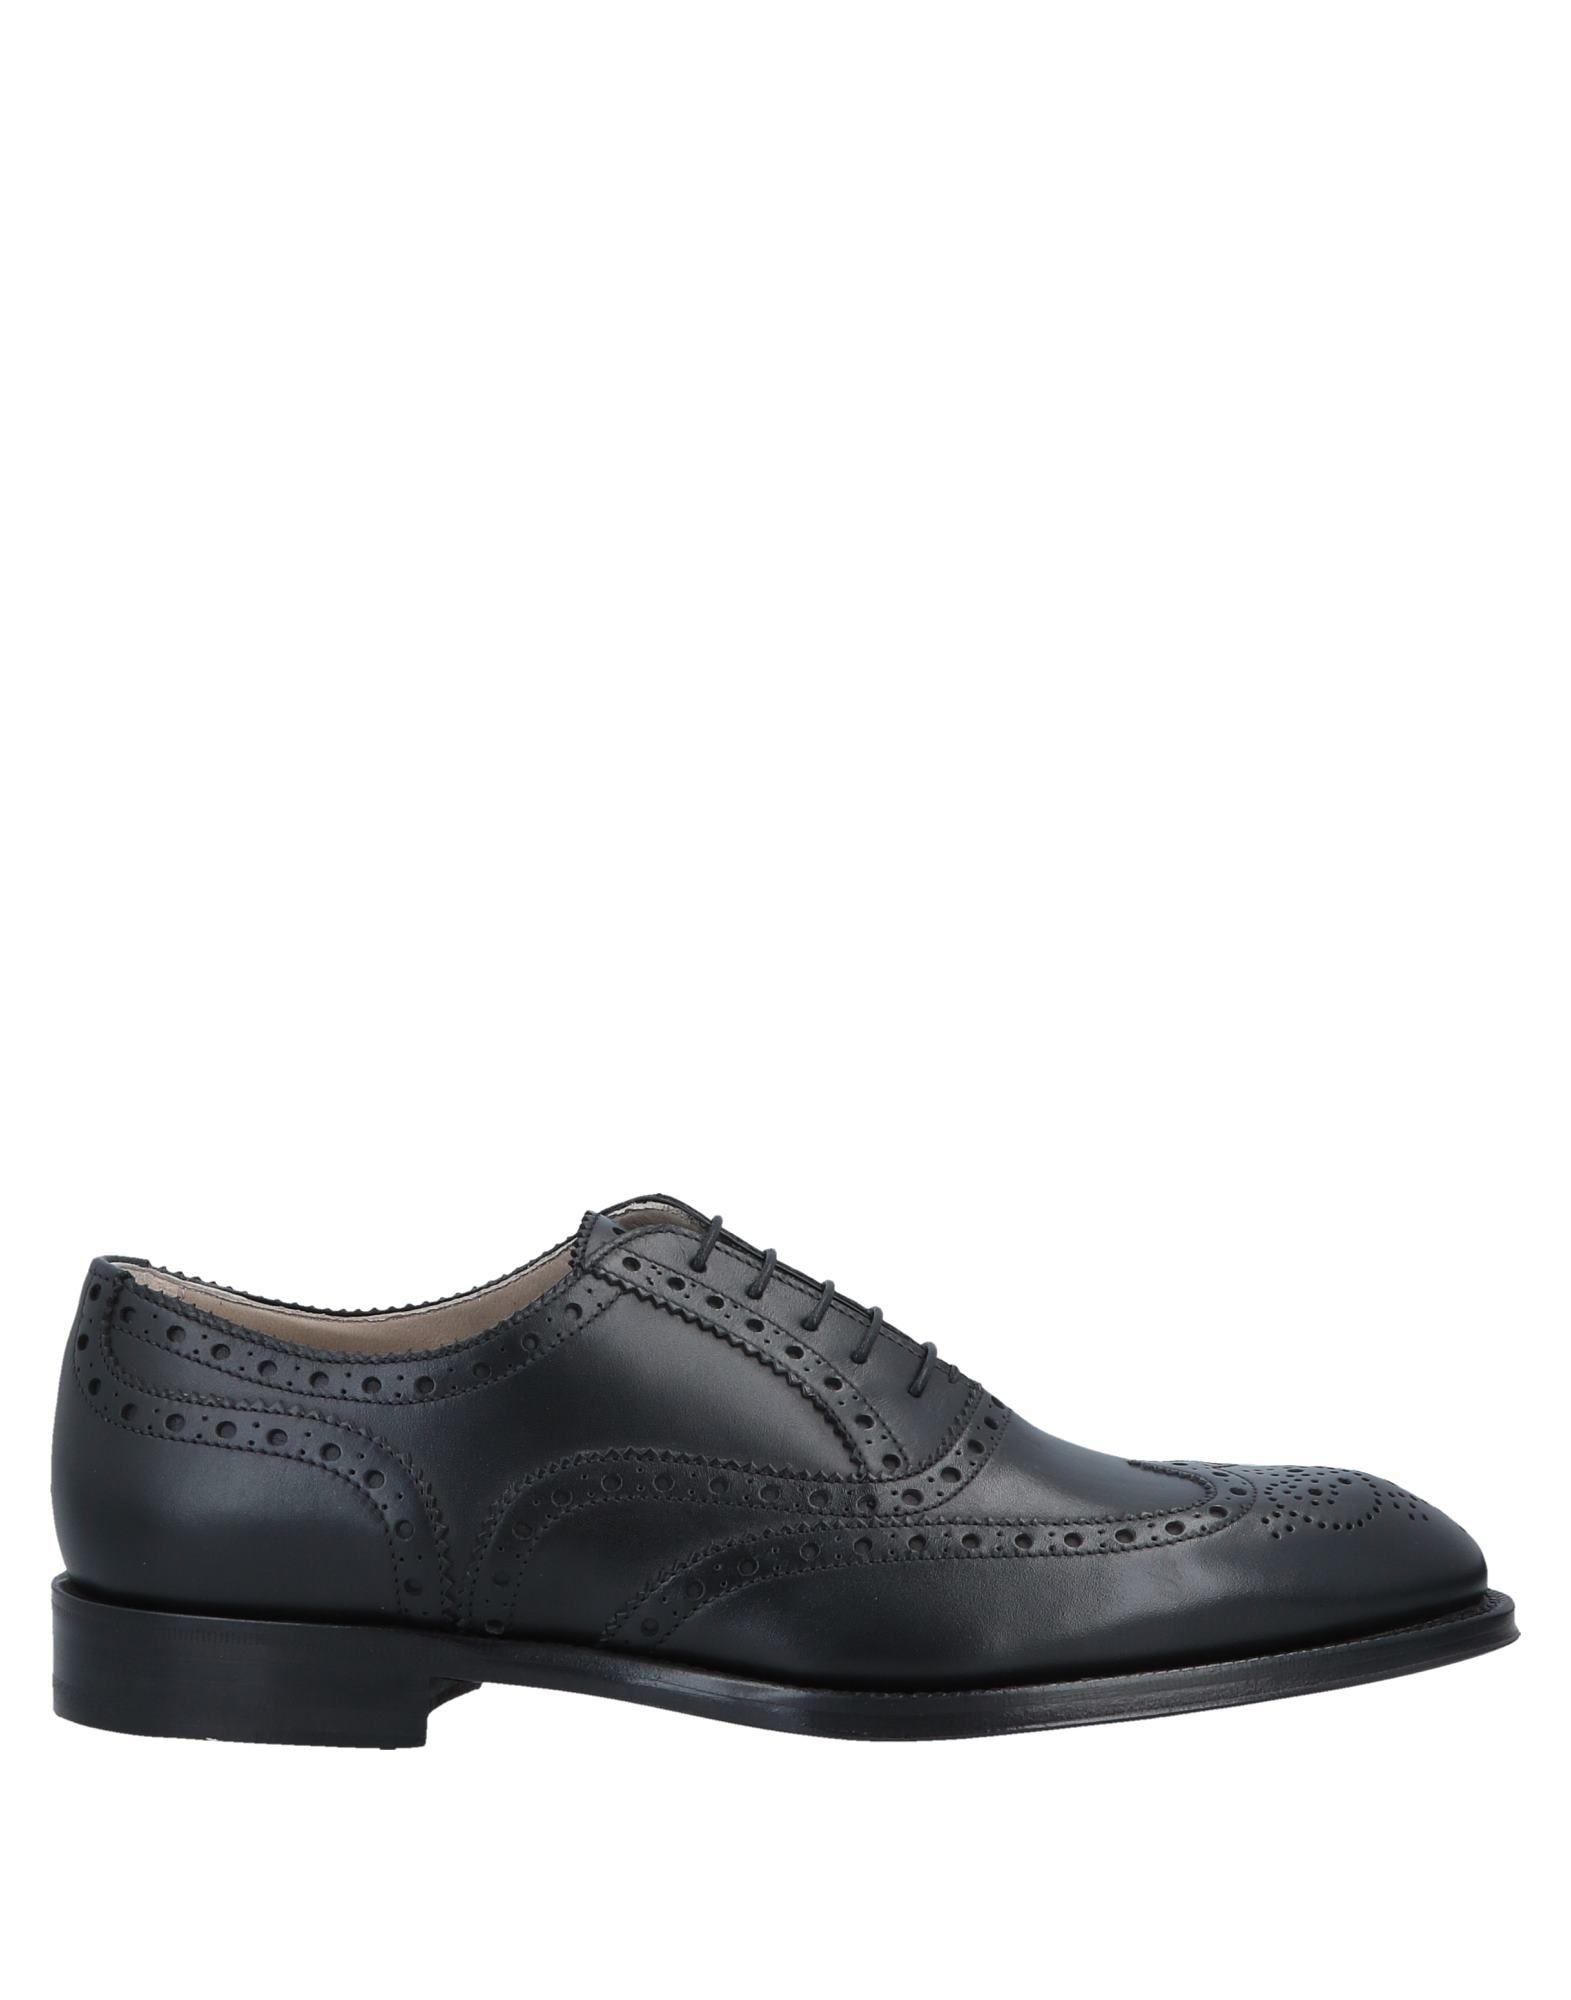 PELUSO NAPOLI Обувь на шнурках обувь ламода